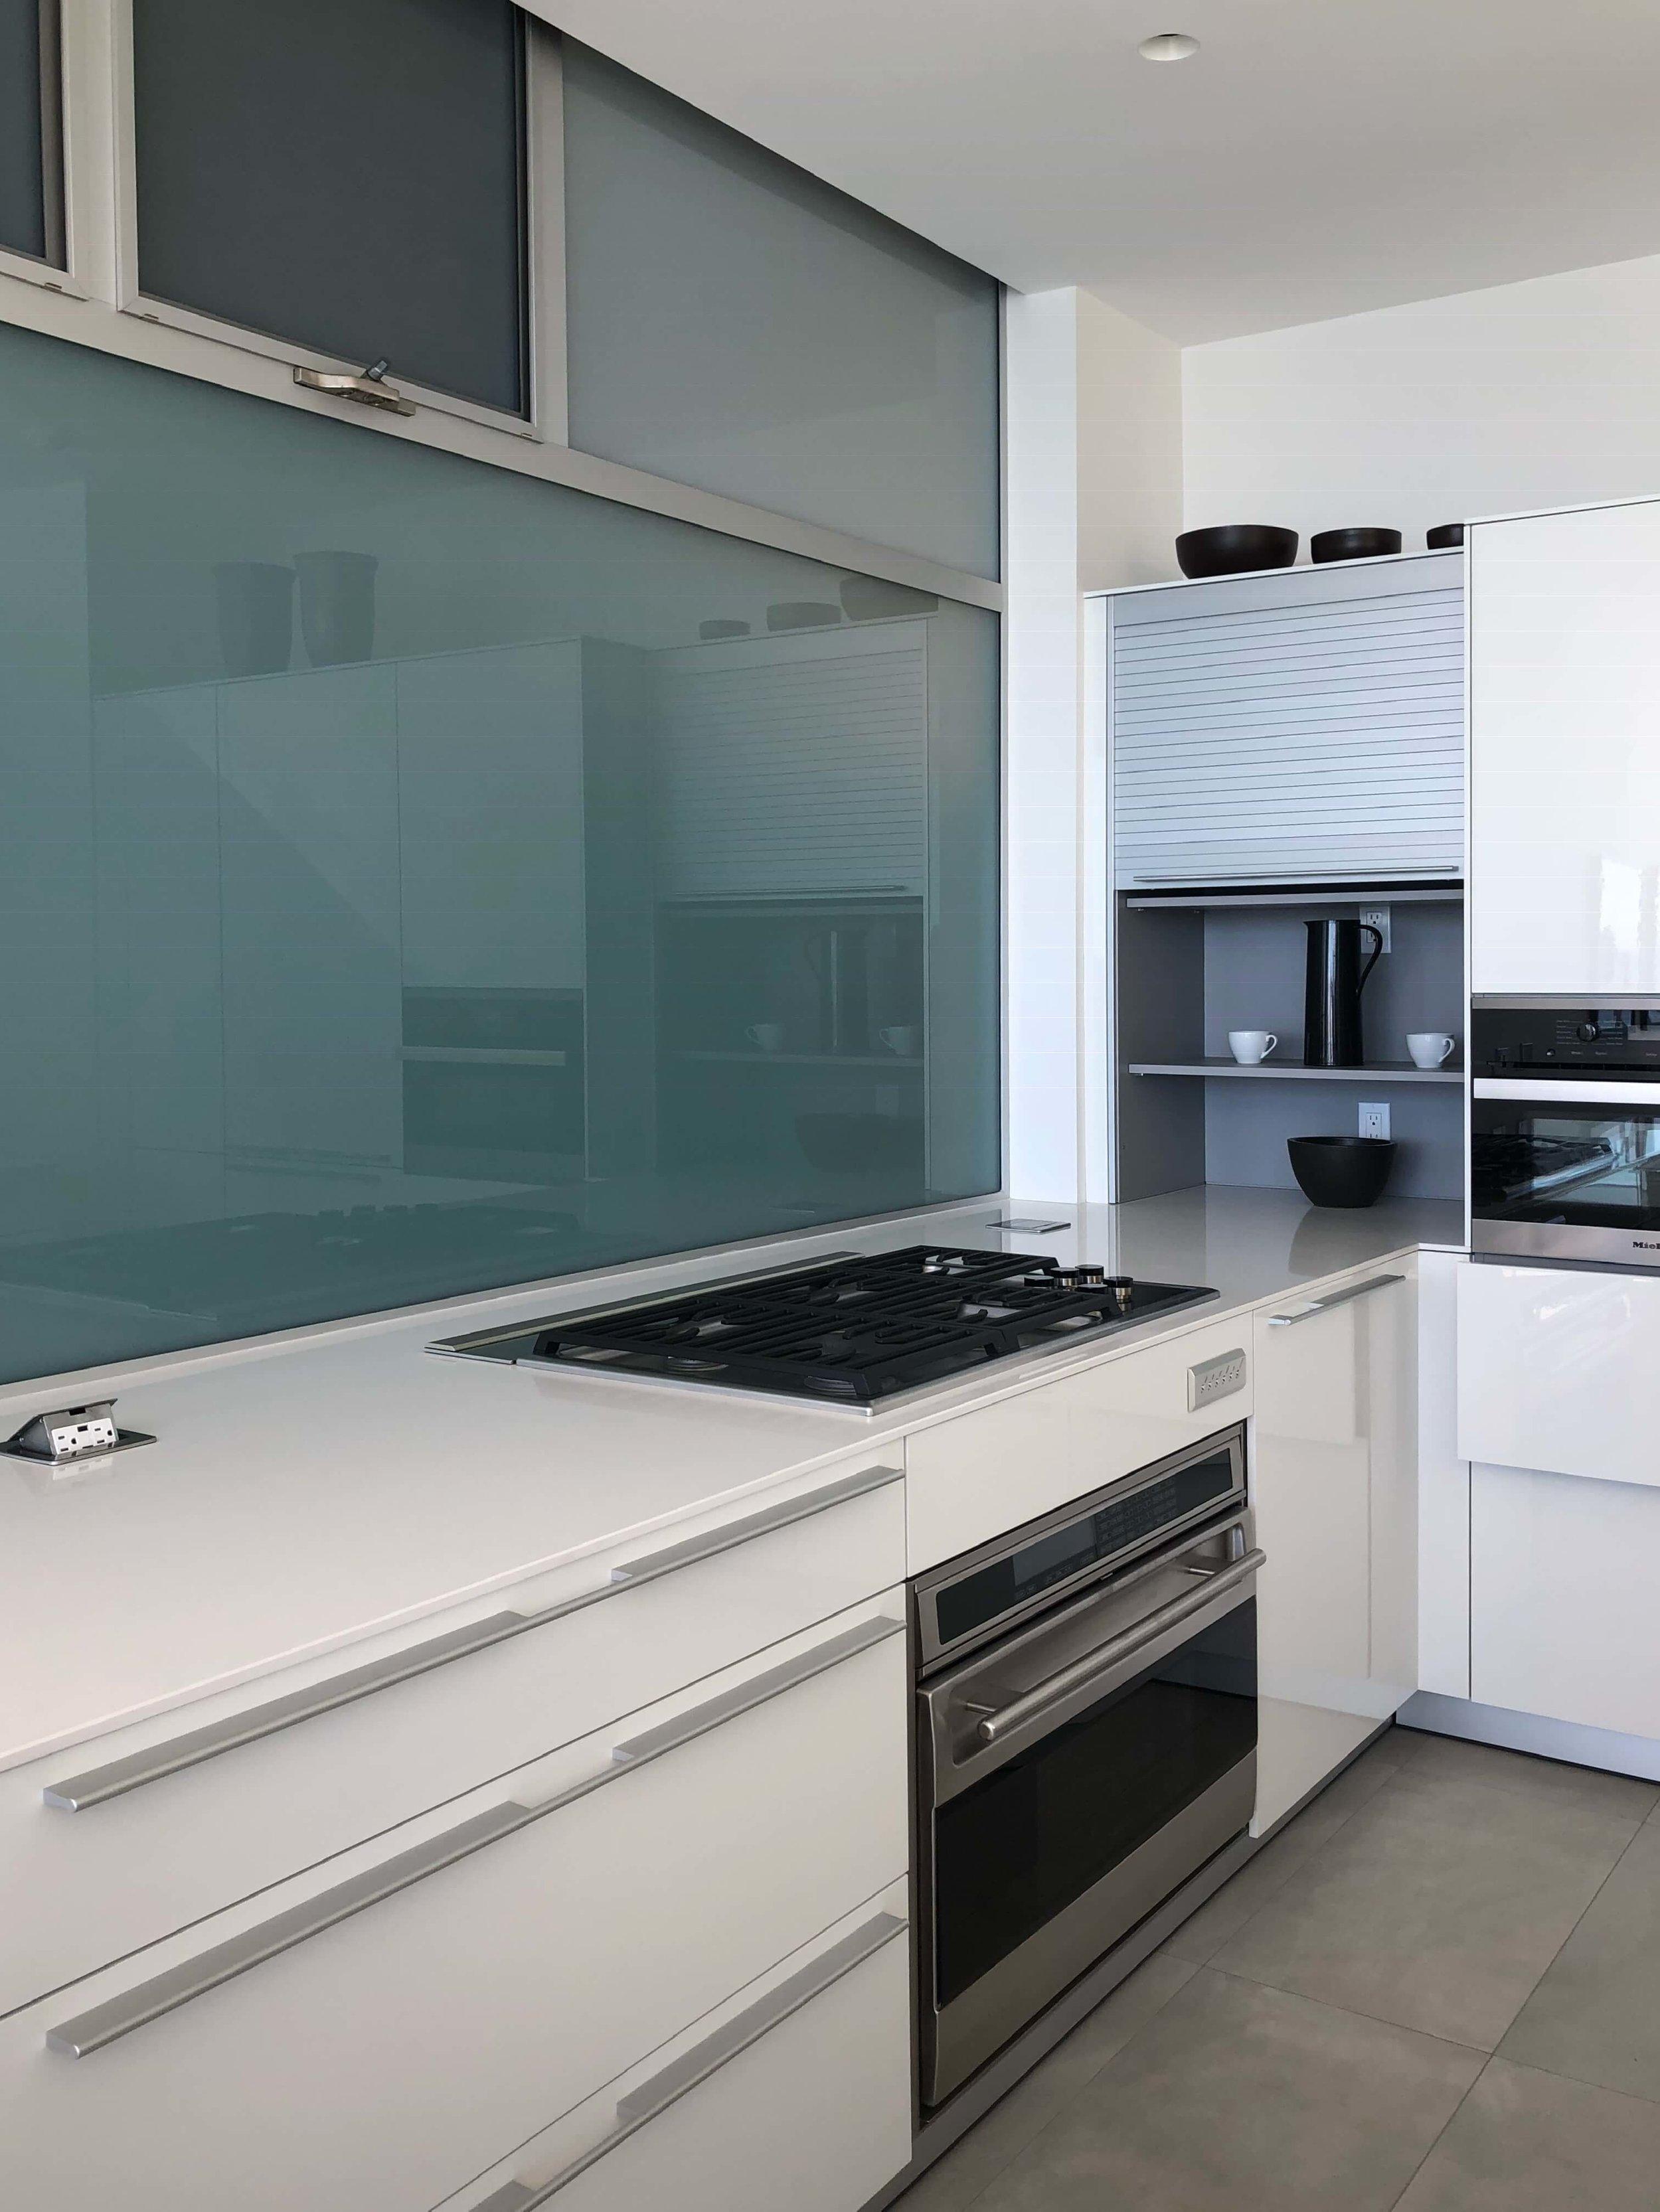 Malibu Home Tour, Dwell on Design, Architect Lorcan O'Herlihy #contemporaryarchitecture